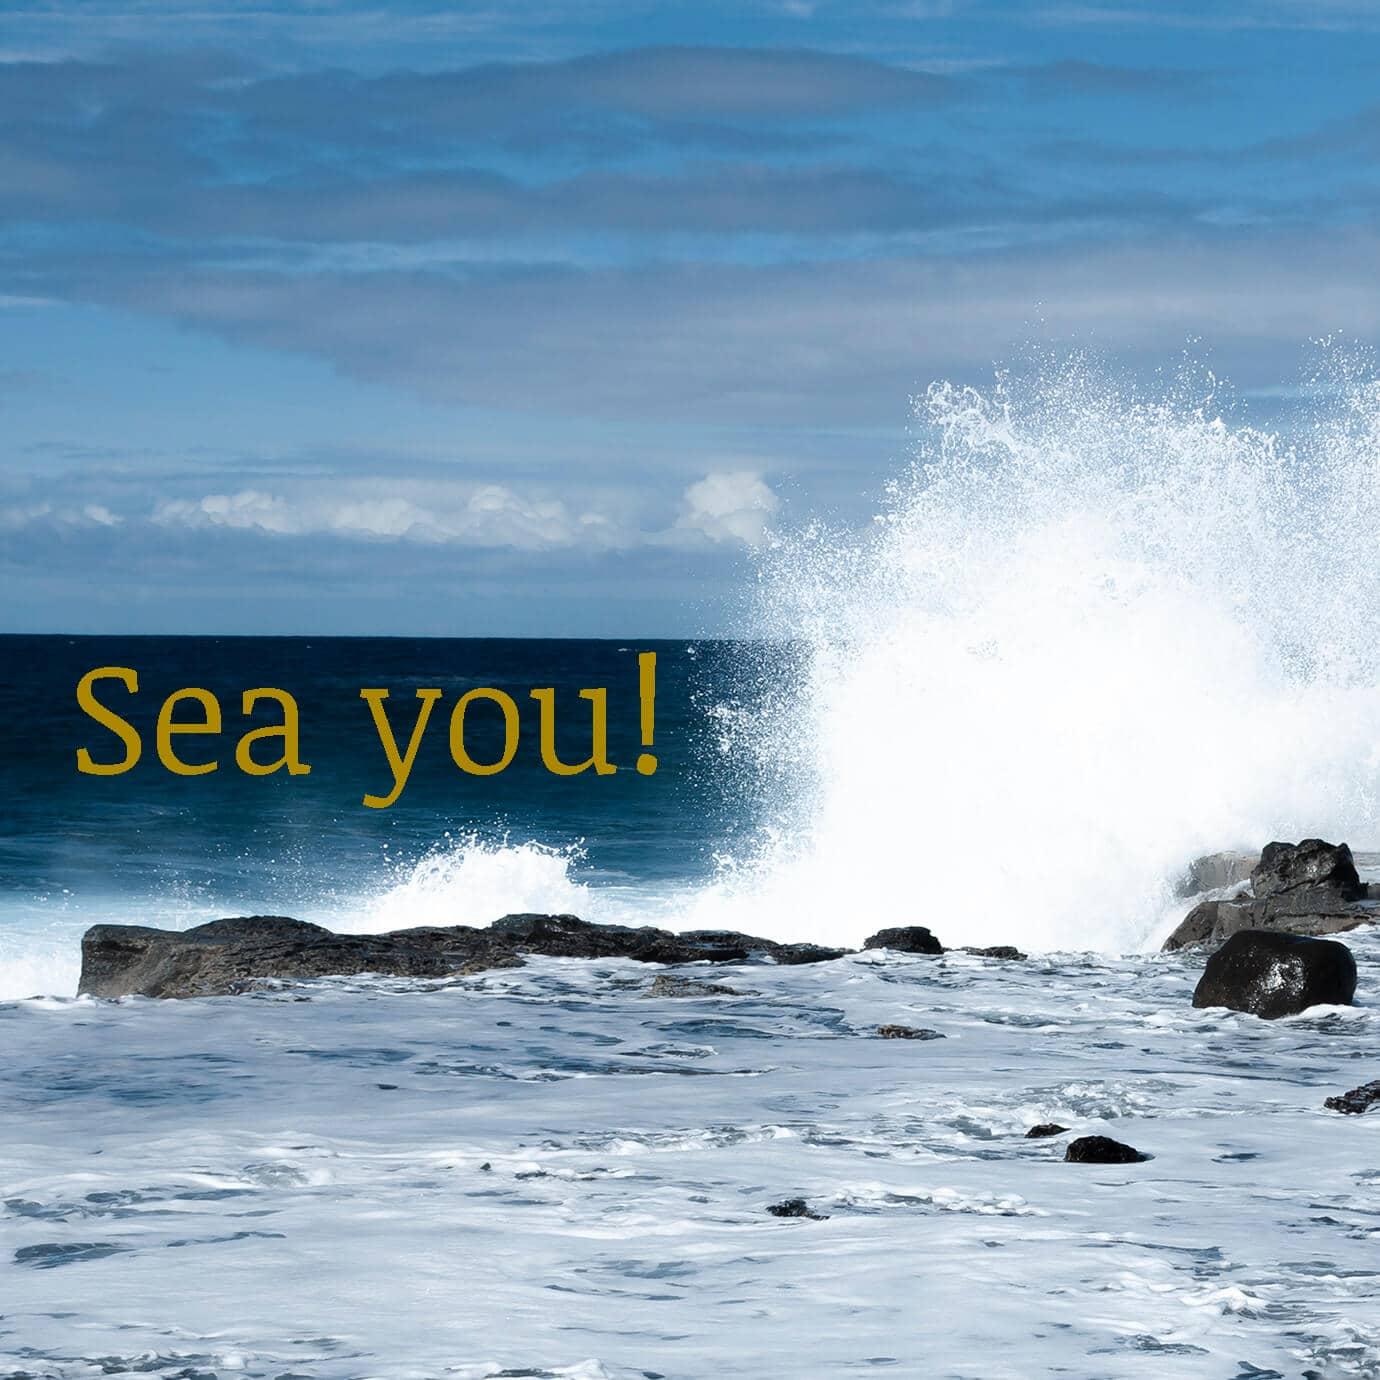 Sea you!